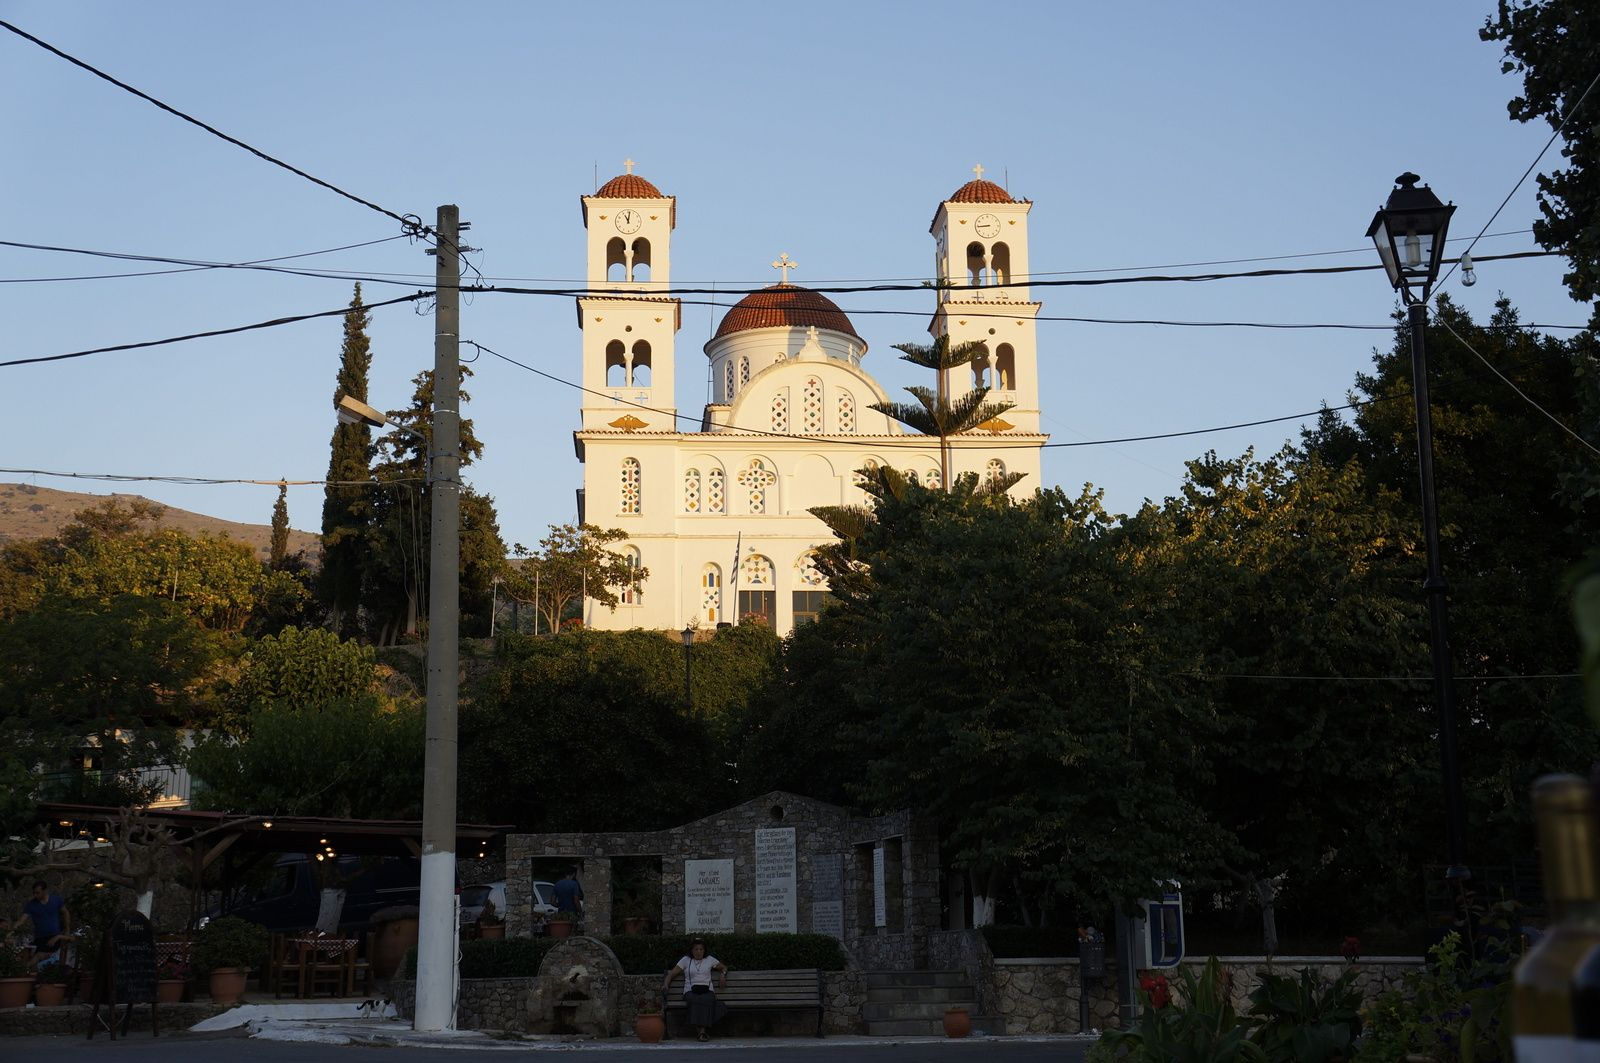 Kandanos in Kreta